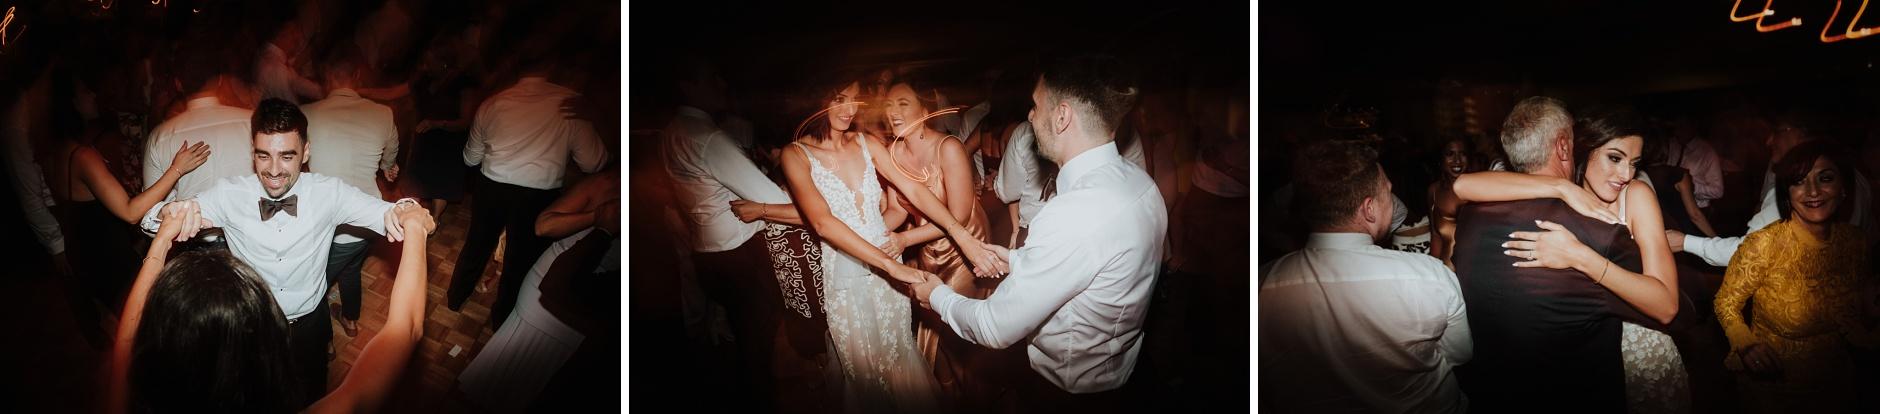 Sydney-Wedding-Photographer_0176.jpg